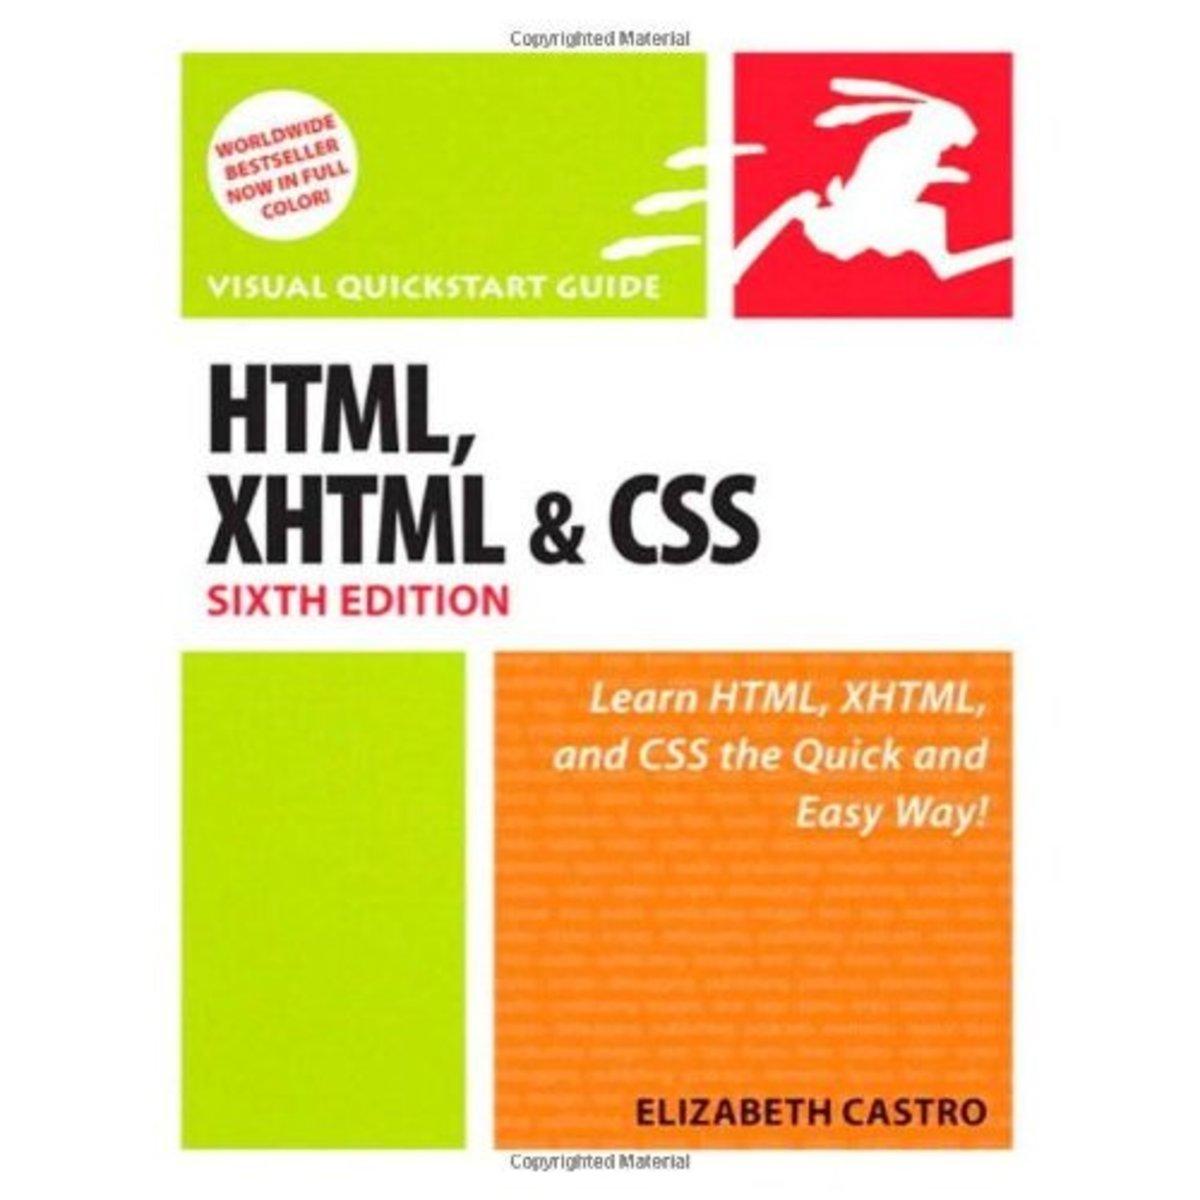 HTML, XHTML & CSS by Elizabeth Castro